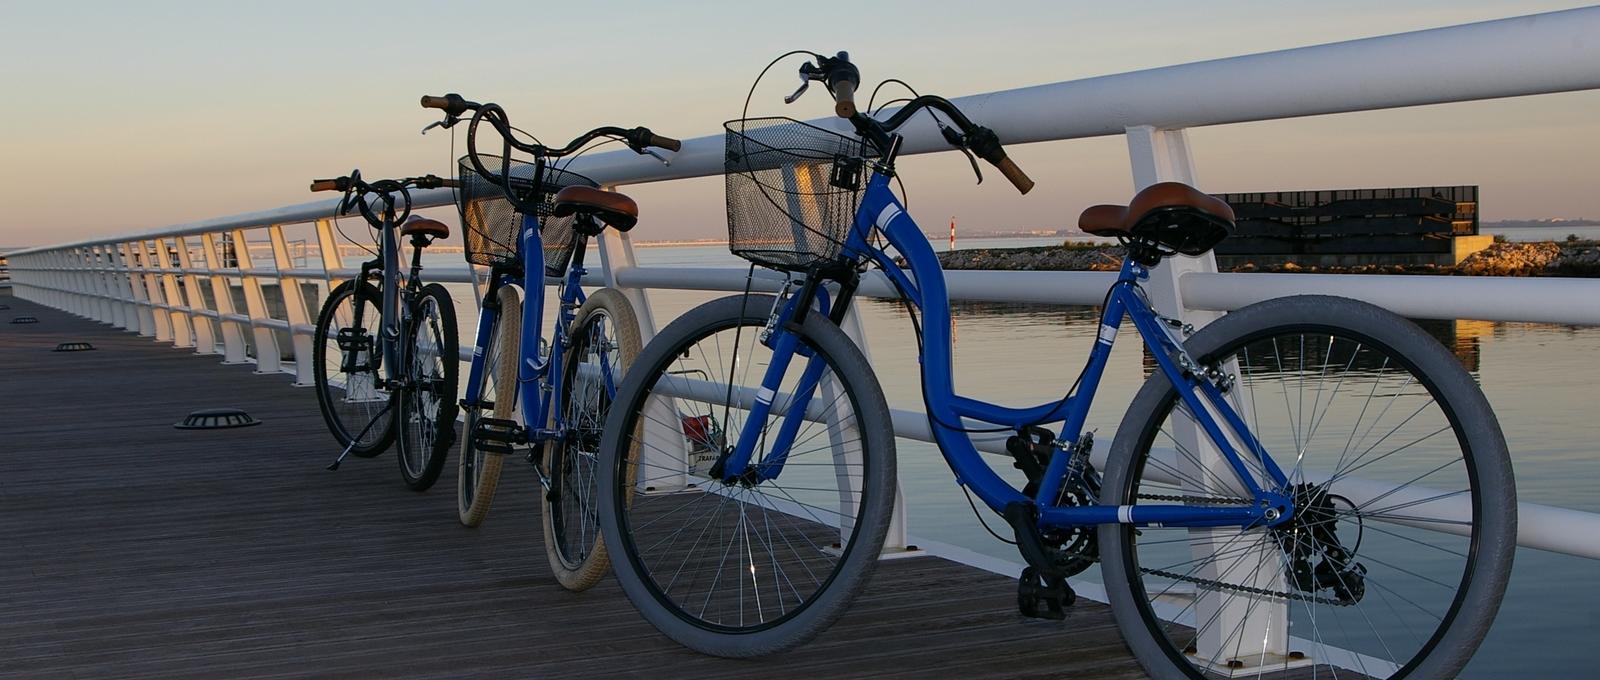 bicicletas_IMGP0014